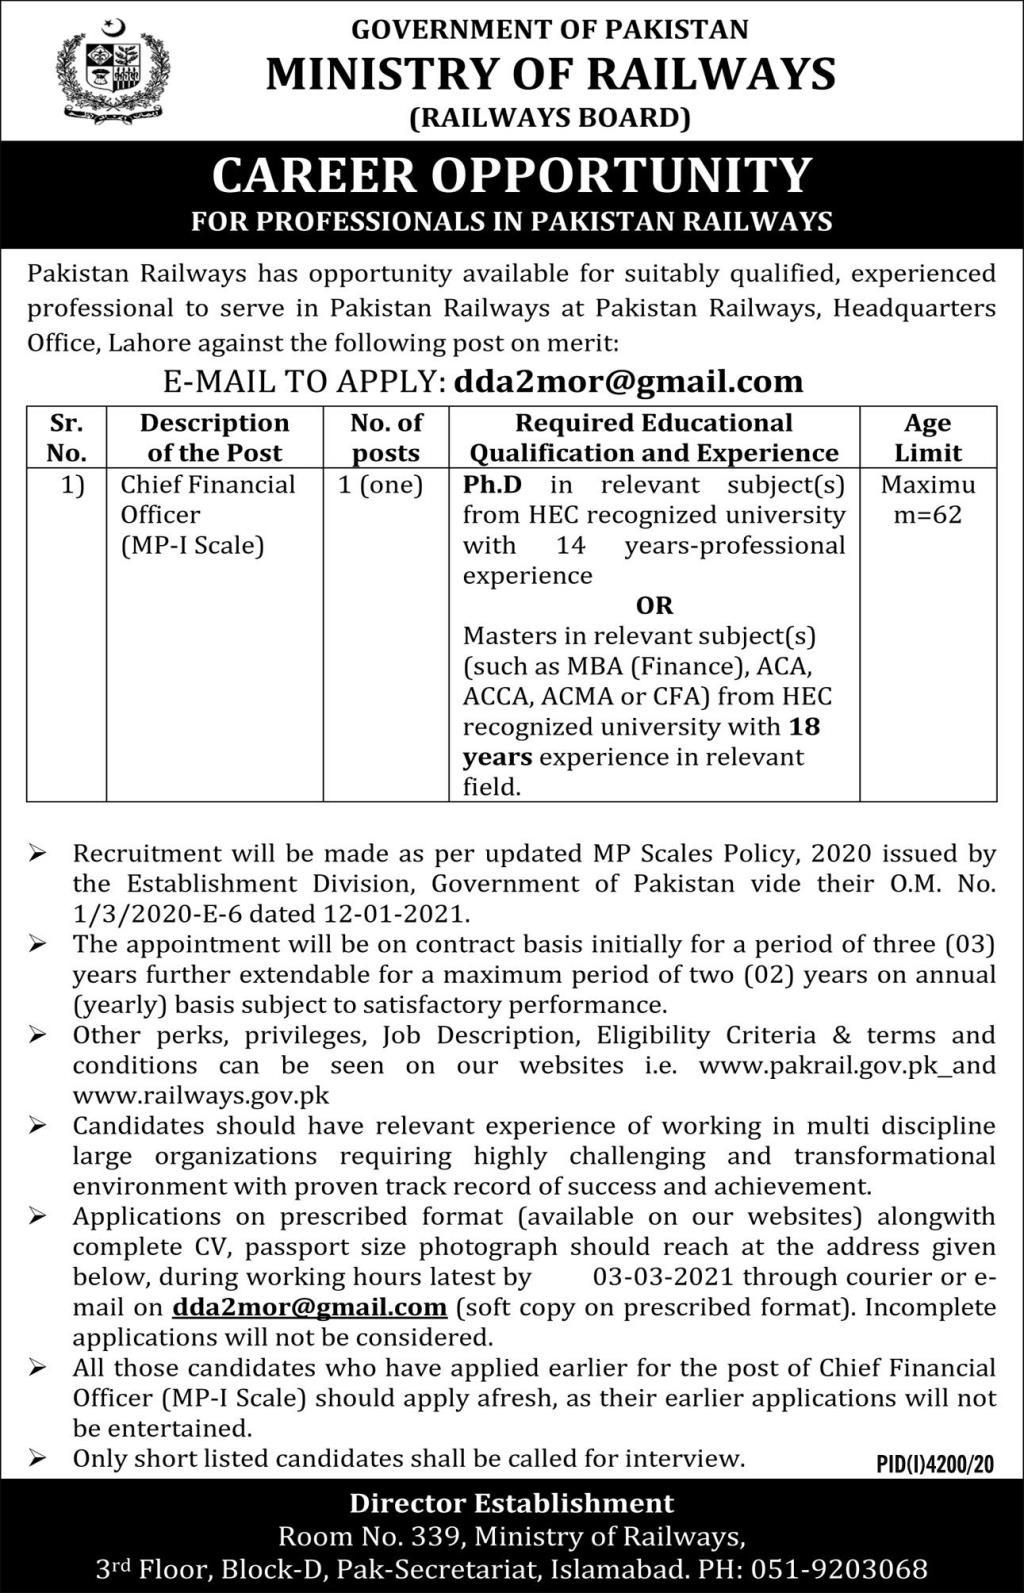 Railway Recruitment - Railway Careers - Railway Jobs 2021 - Railway Job Vacancy -  Railway Vacancy - Online Apply - dda2mor@gmaill.com